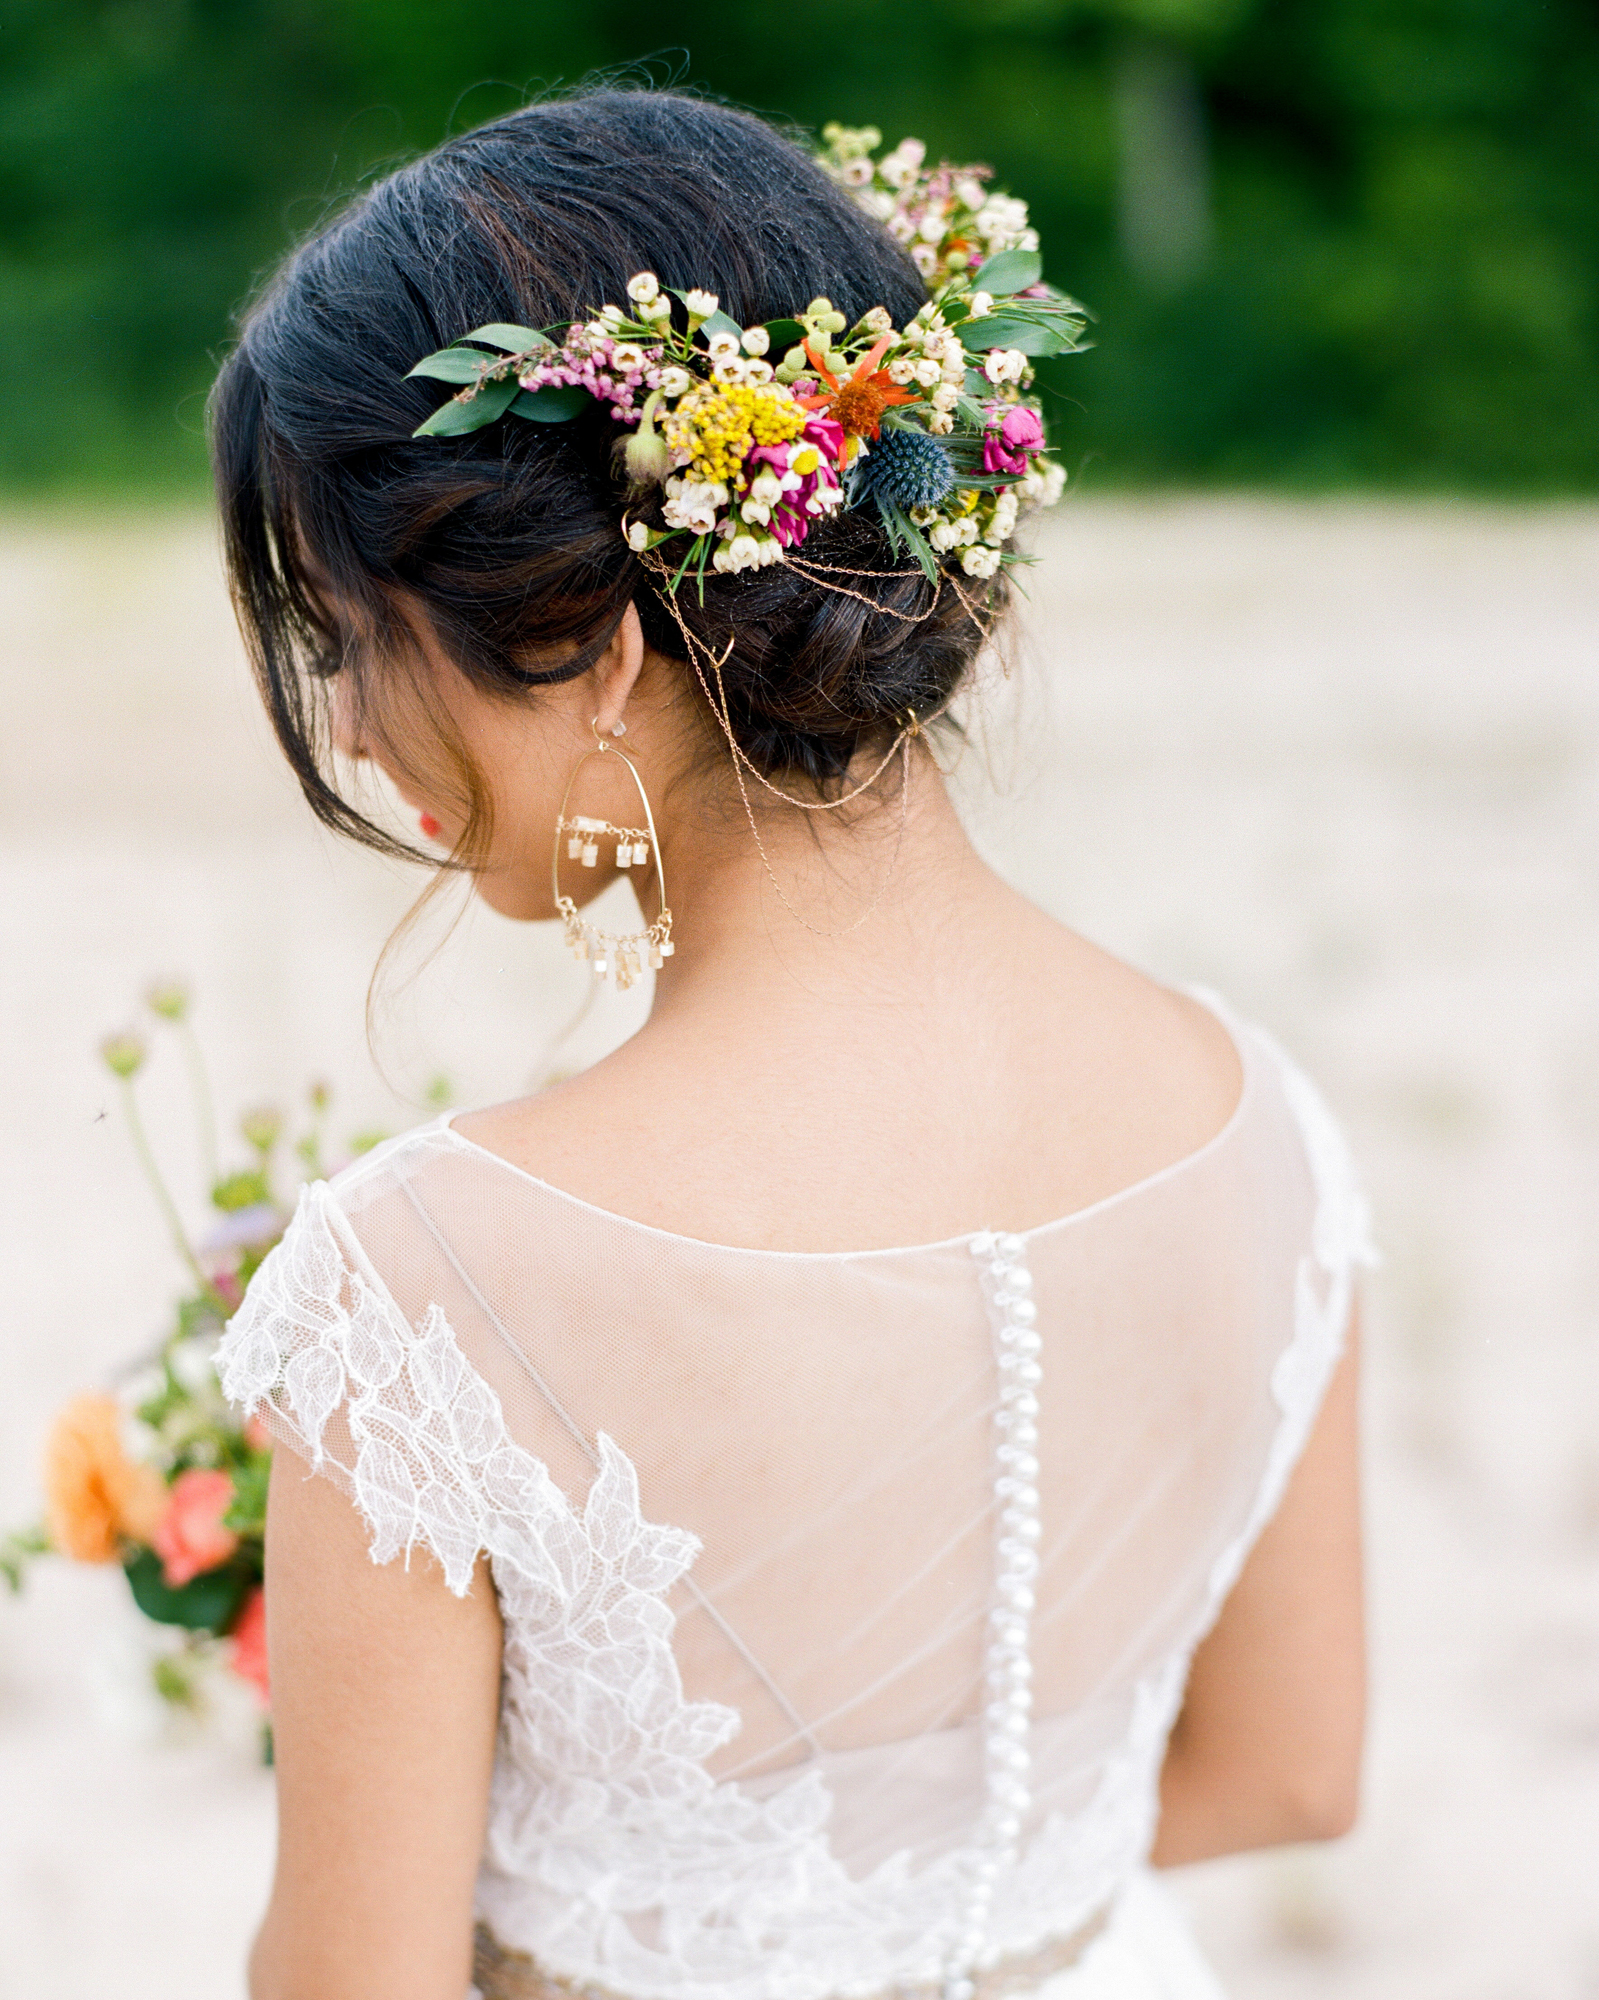 atalia-raul-wedding-bride-35-s112395-1215.jpg